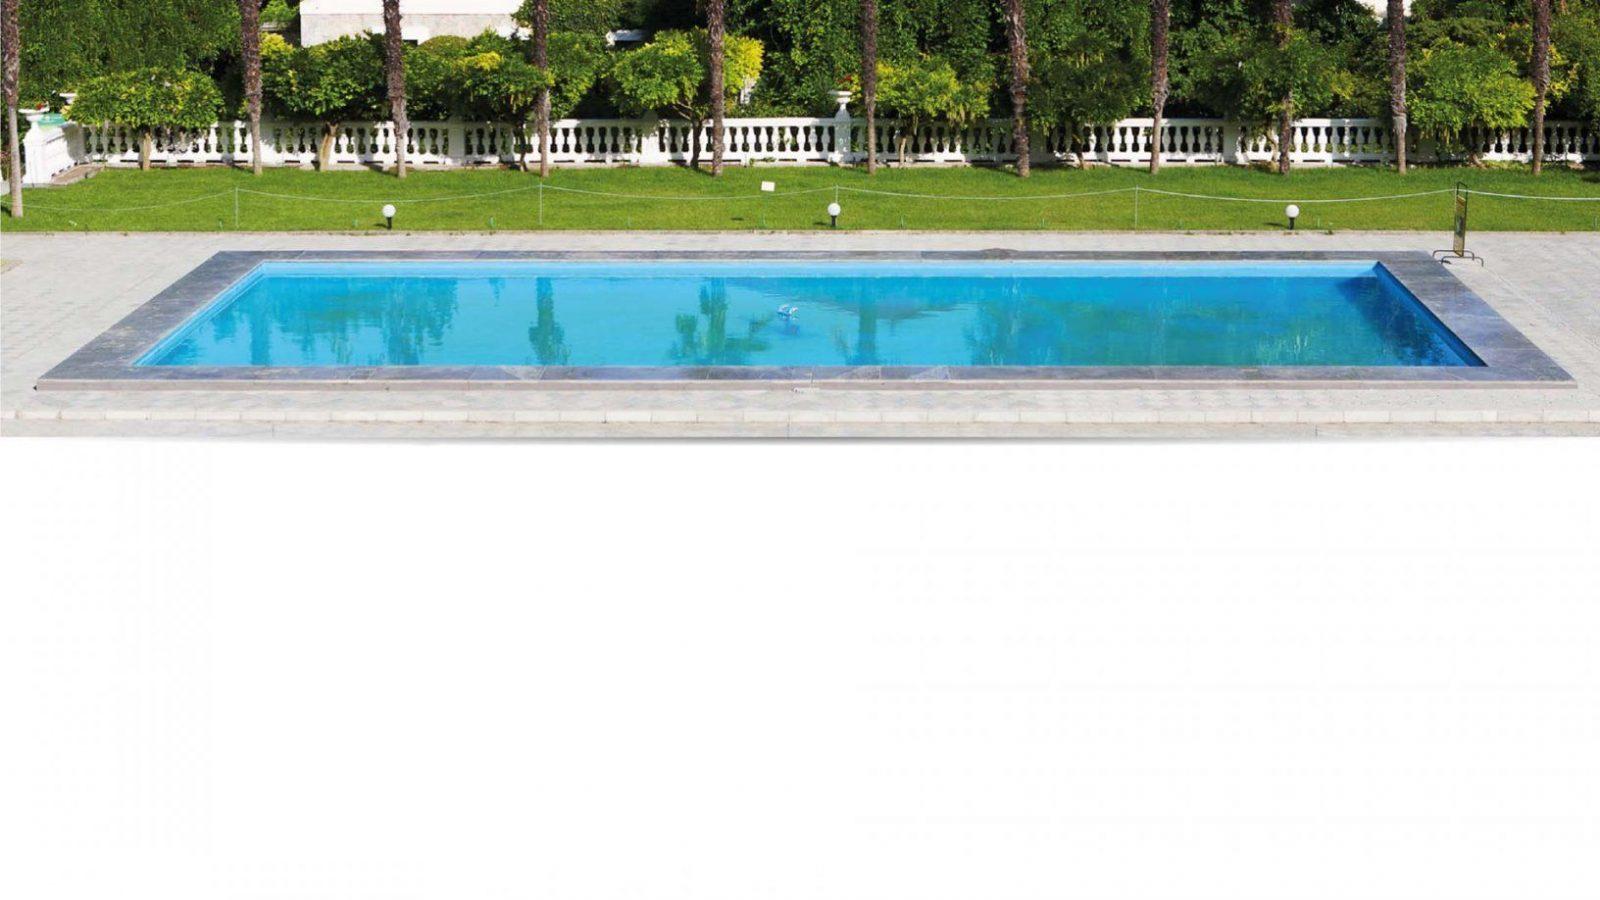 Gfk becken aus polen haus design ideen for Pool design company polen